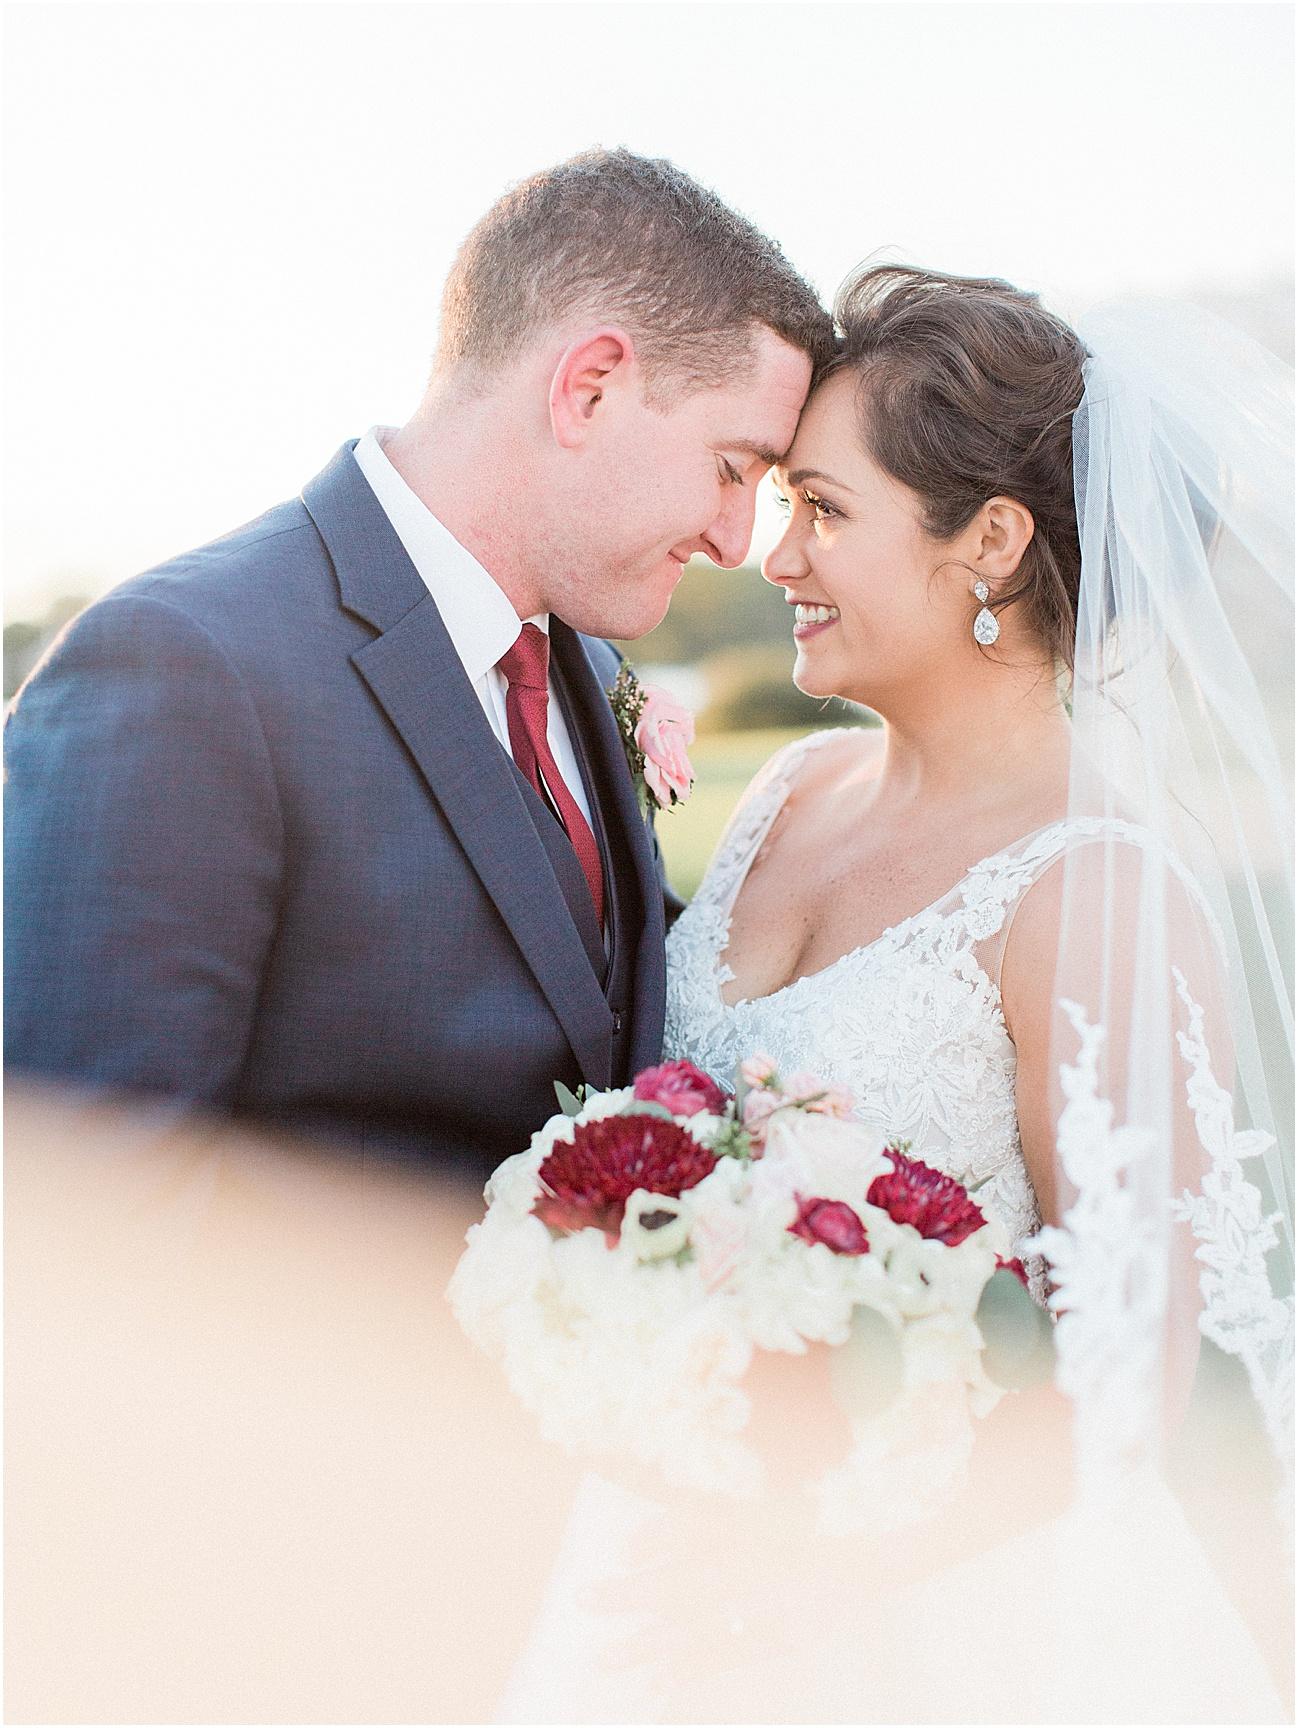 shannon_daniel_dan_atlantic_resort_saint_marys_st_mary_church_fall_newport_catholic_irish_cape_cod_boston_wedding_photographer_meredith_jane_photography_photo_1642.jpg